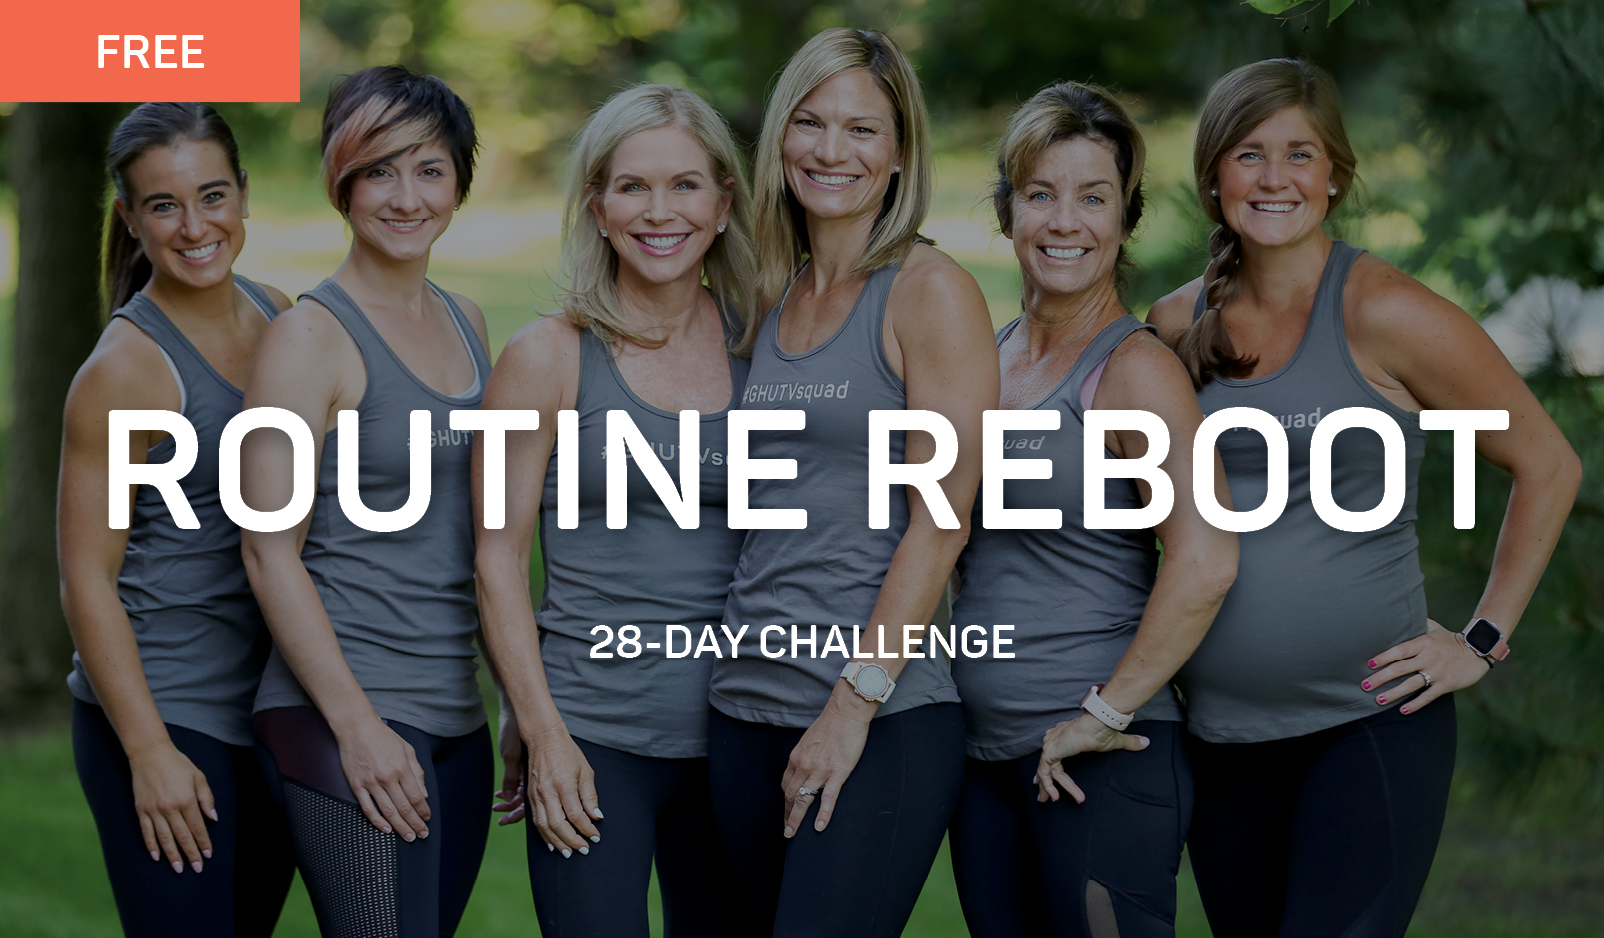 Routine Reboot Fitness Challenge